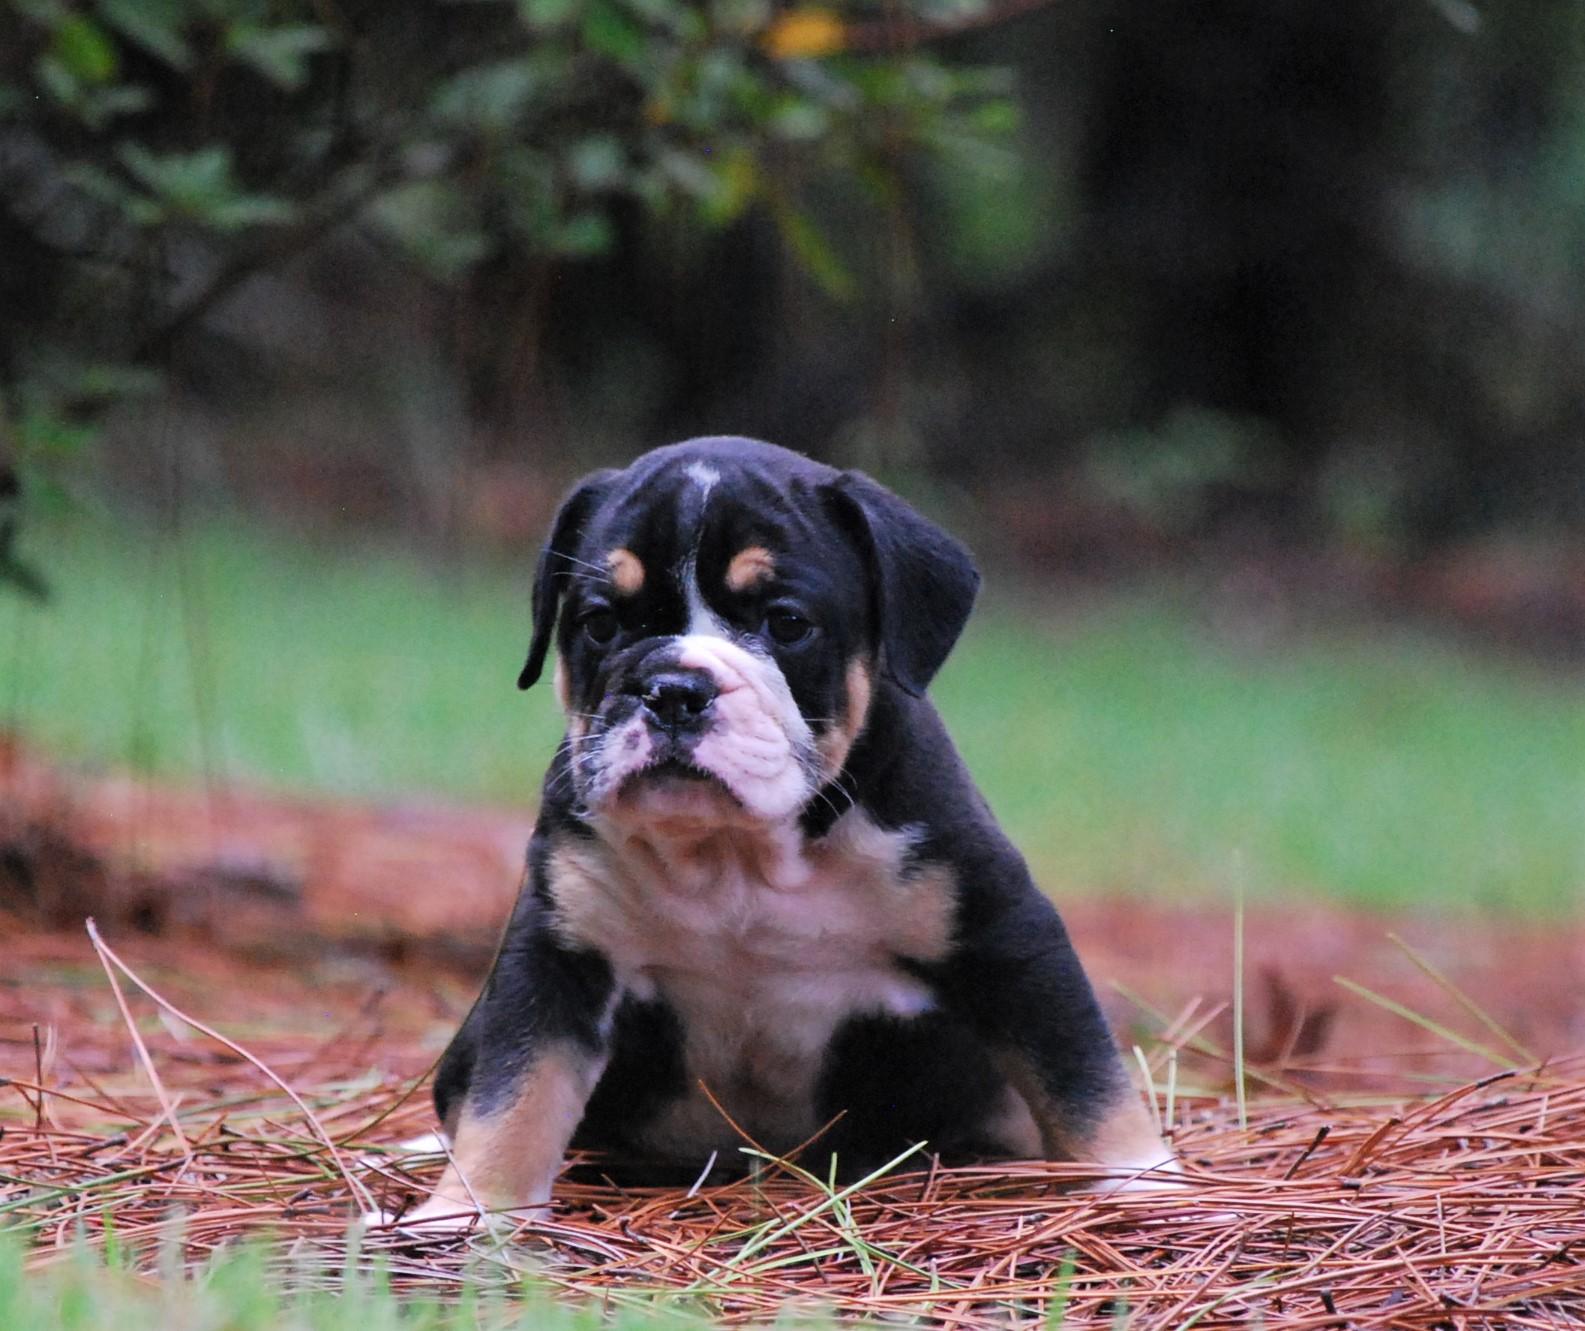 Raven Olde English Bulldogge Puppy For Sale | Photo 1